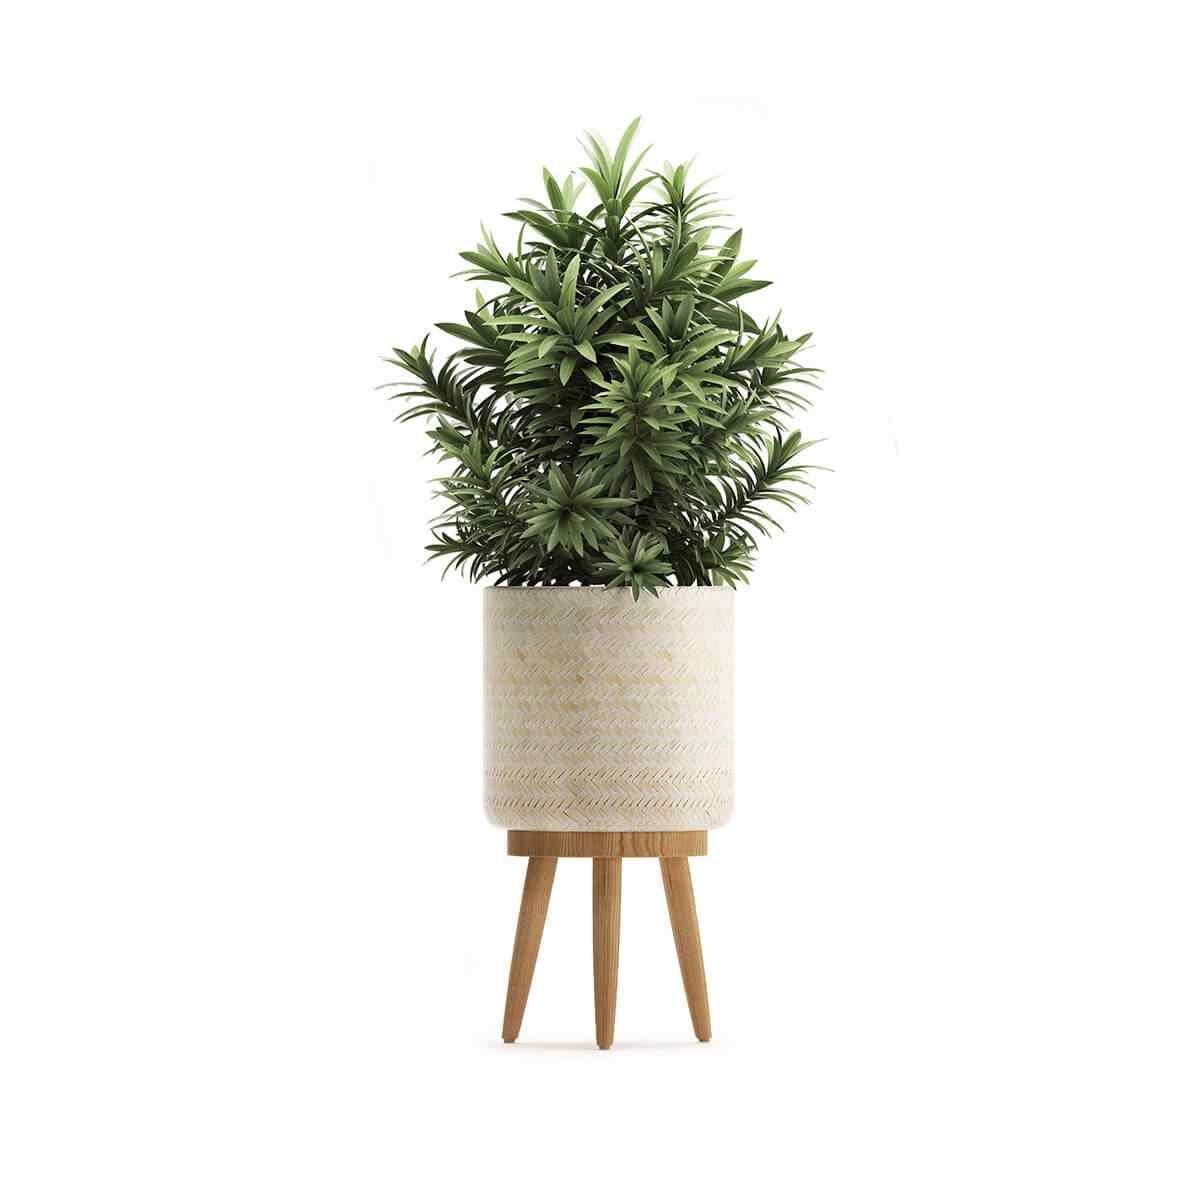 https://greenshade.com.au/wp-content/uploads/2018/09/product_07.jpg